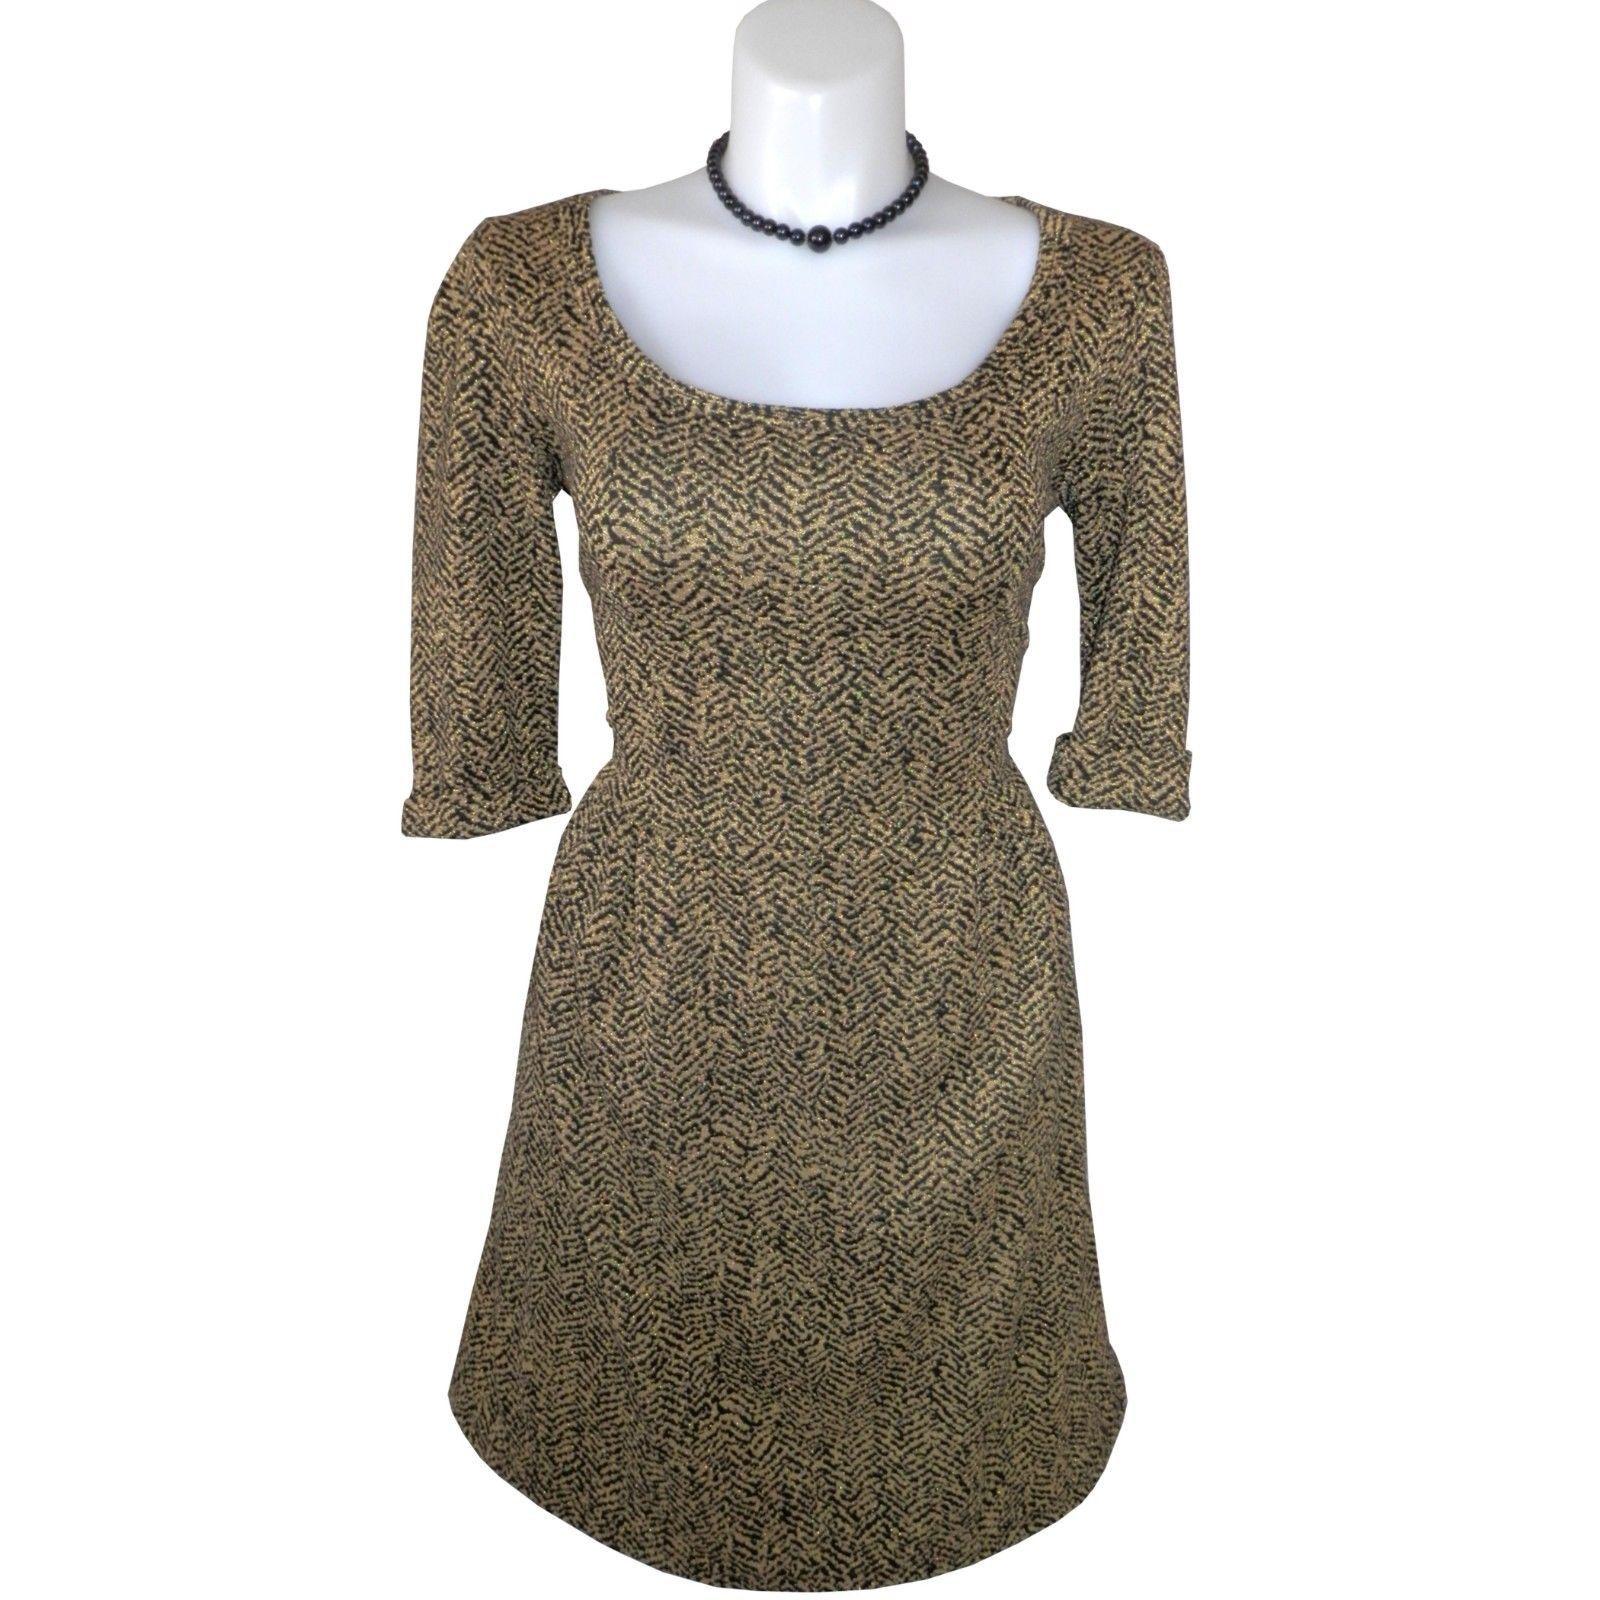 Awesome amazing nwt gold u black tweed pattern rayon melissa masse